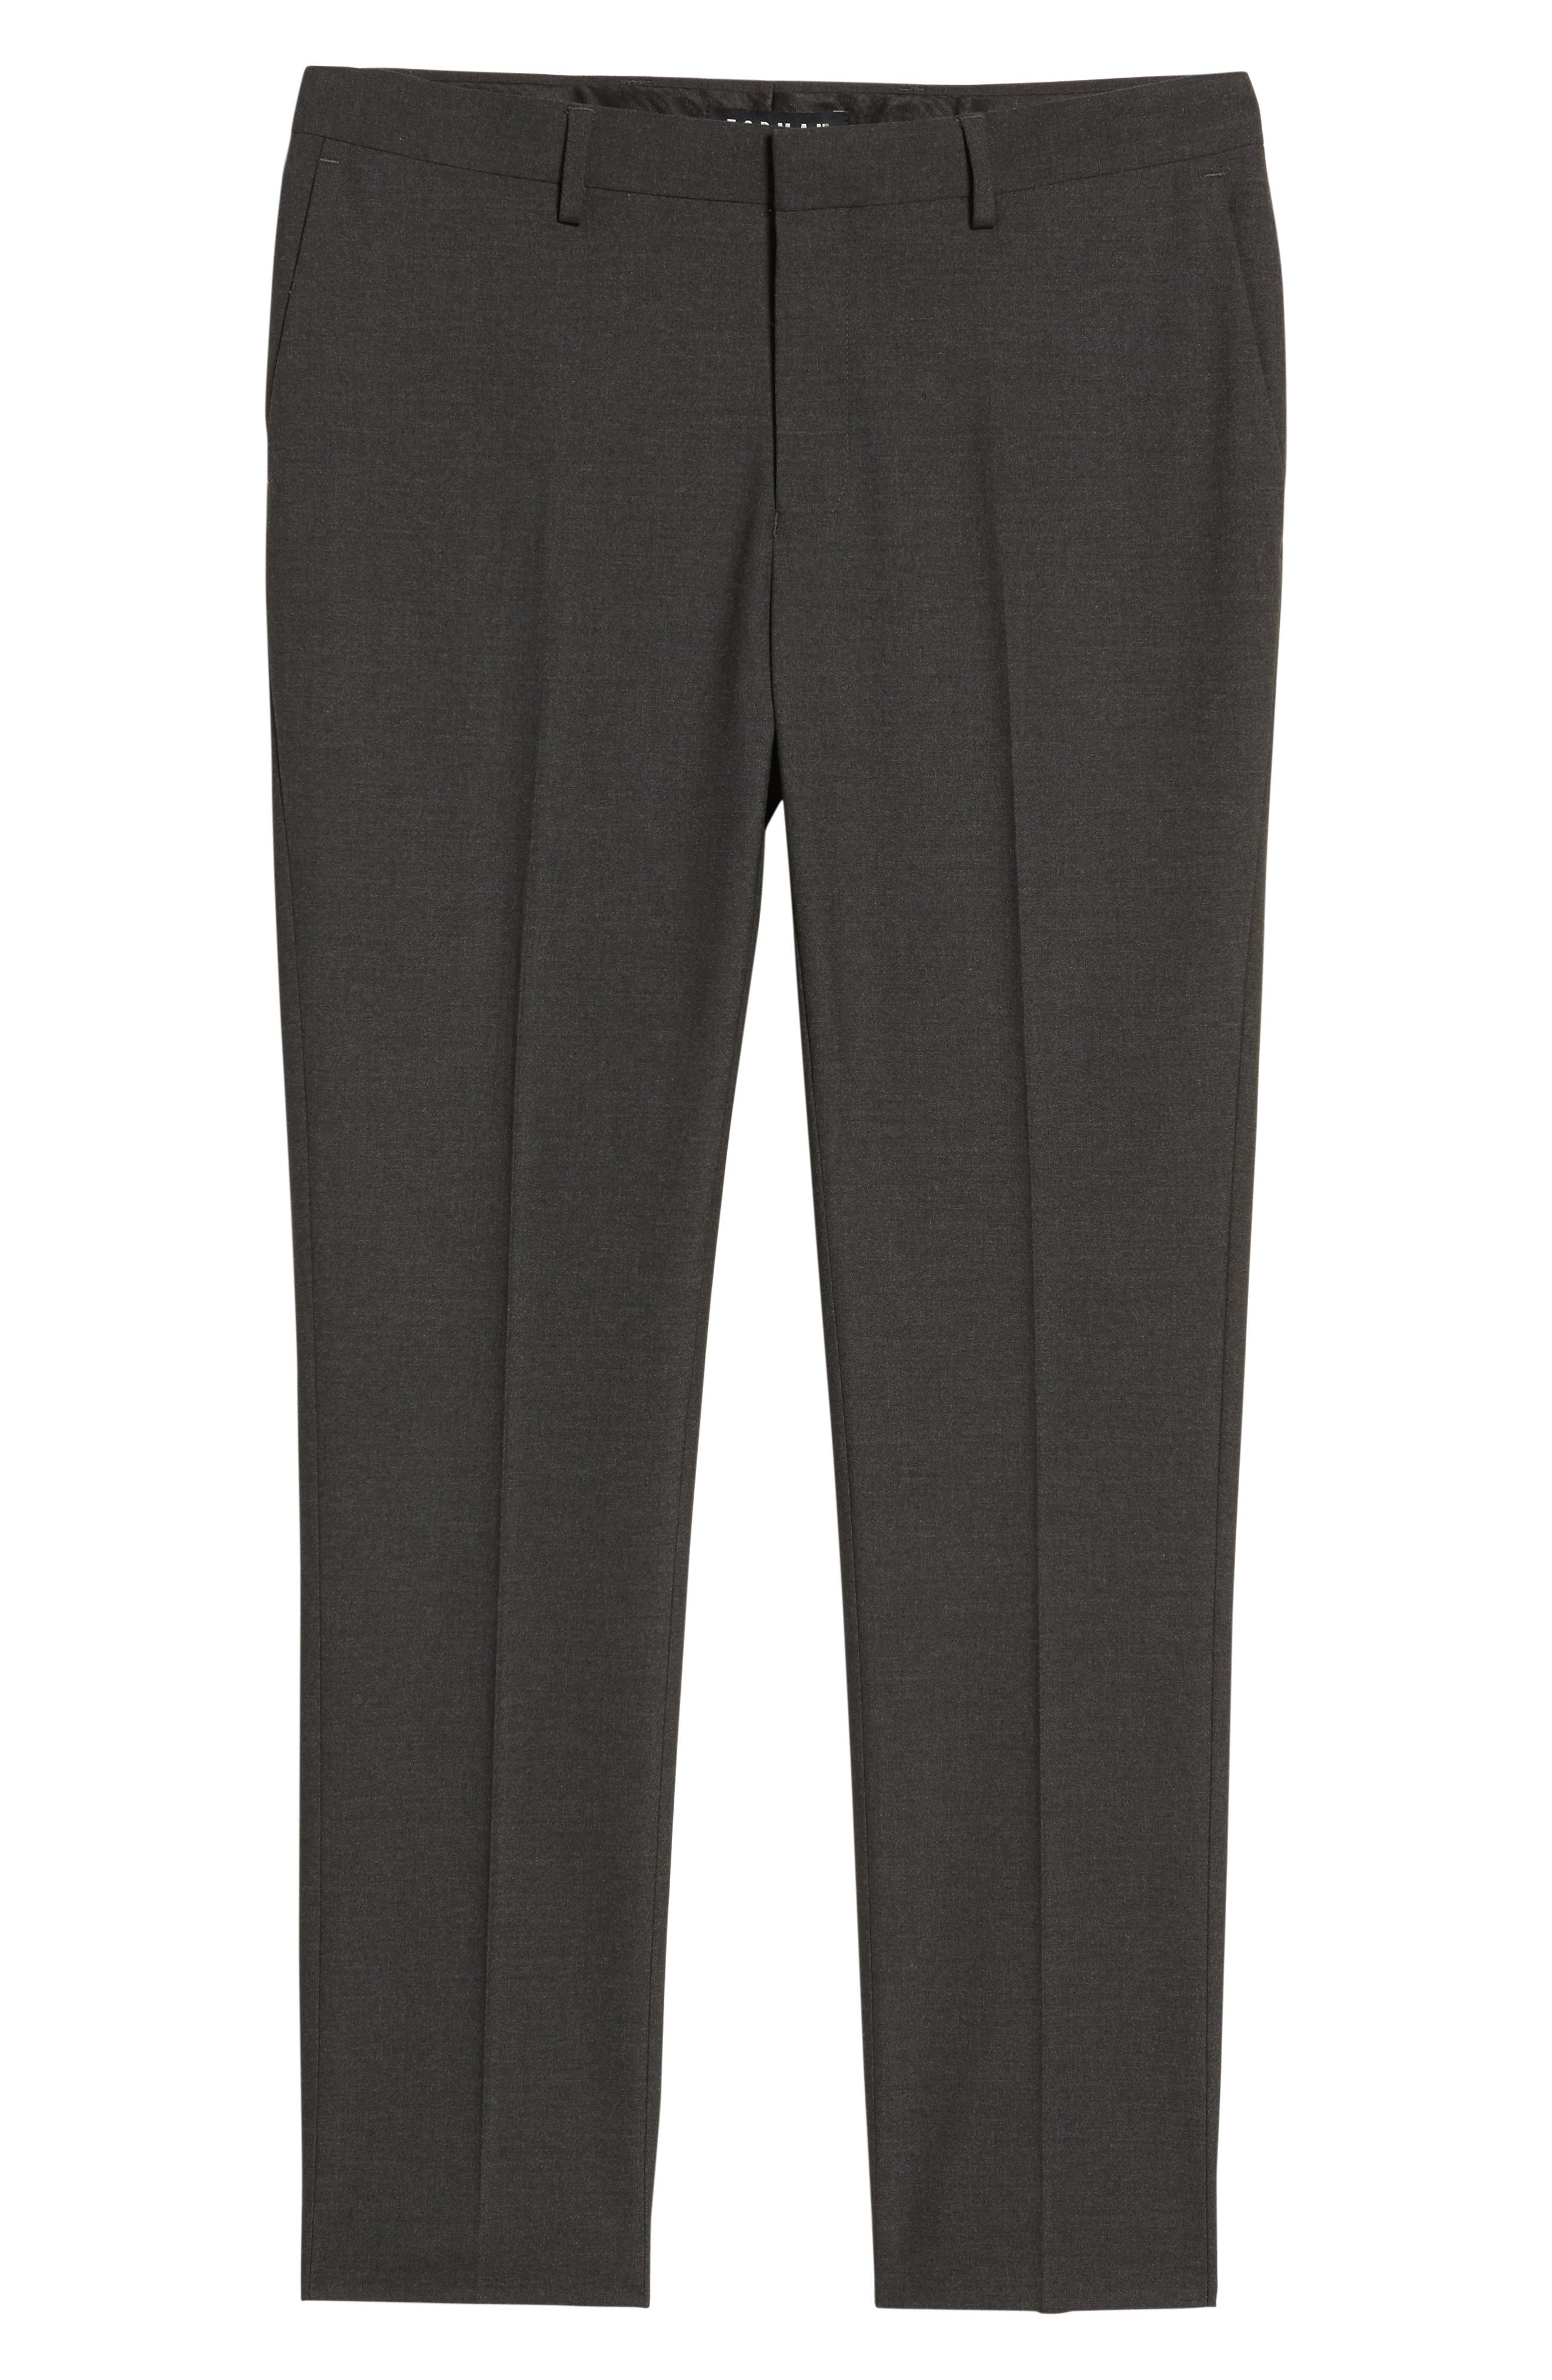 Black Skinny Fit Trousers,                             Alternate thumbnail 11, color,